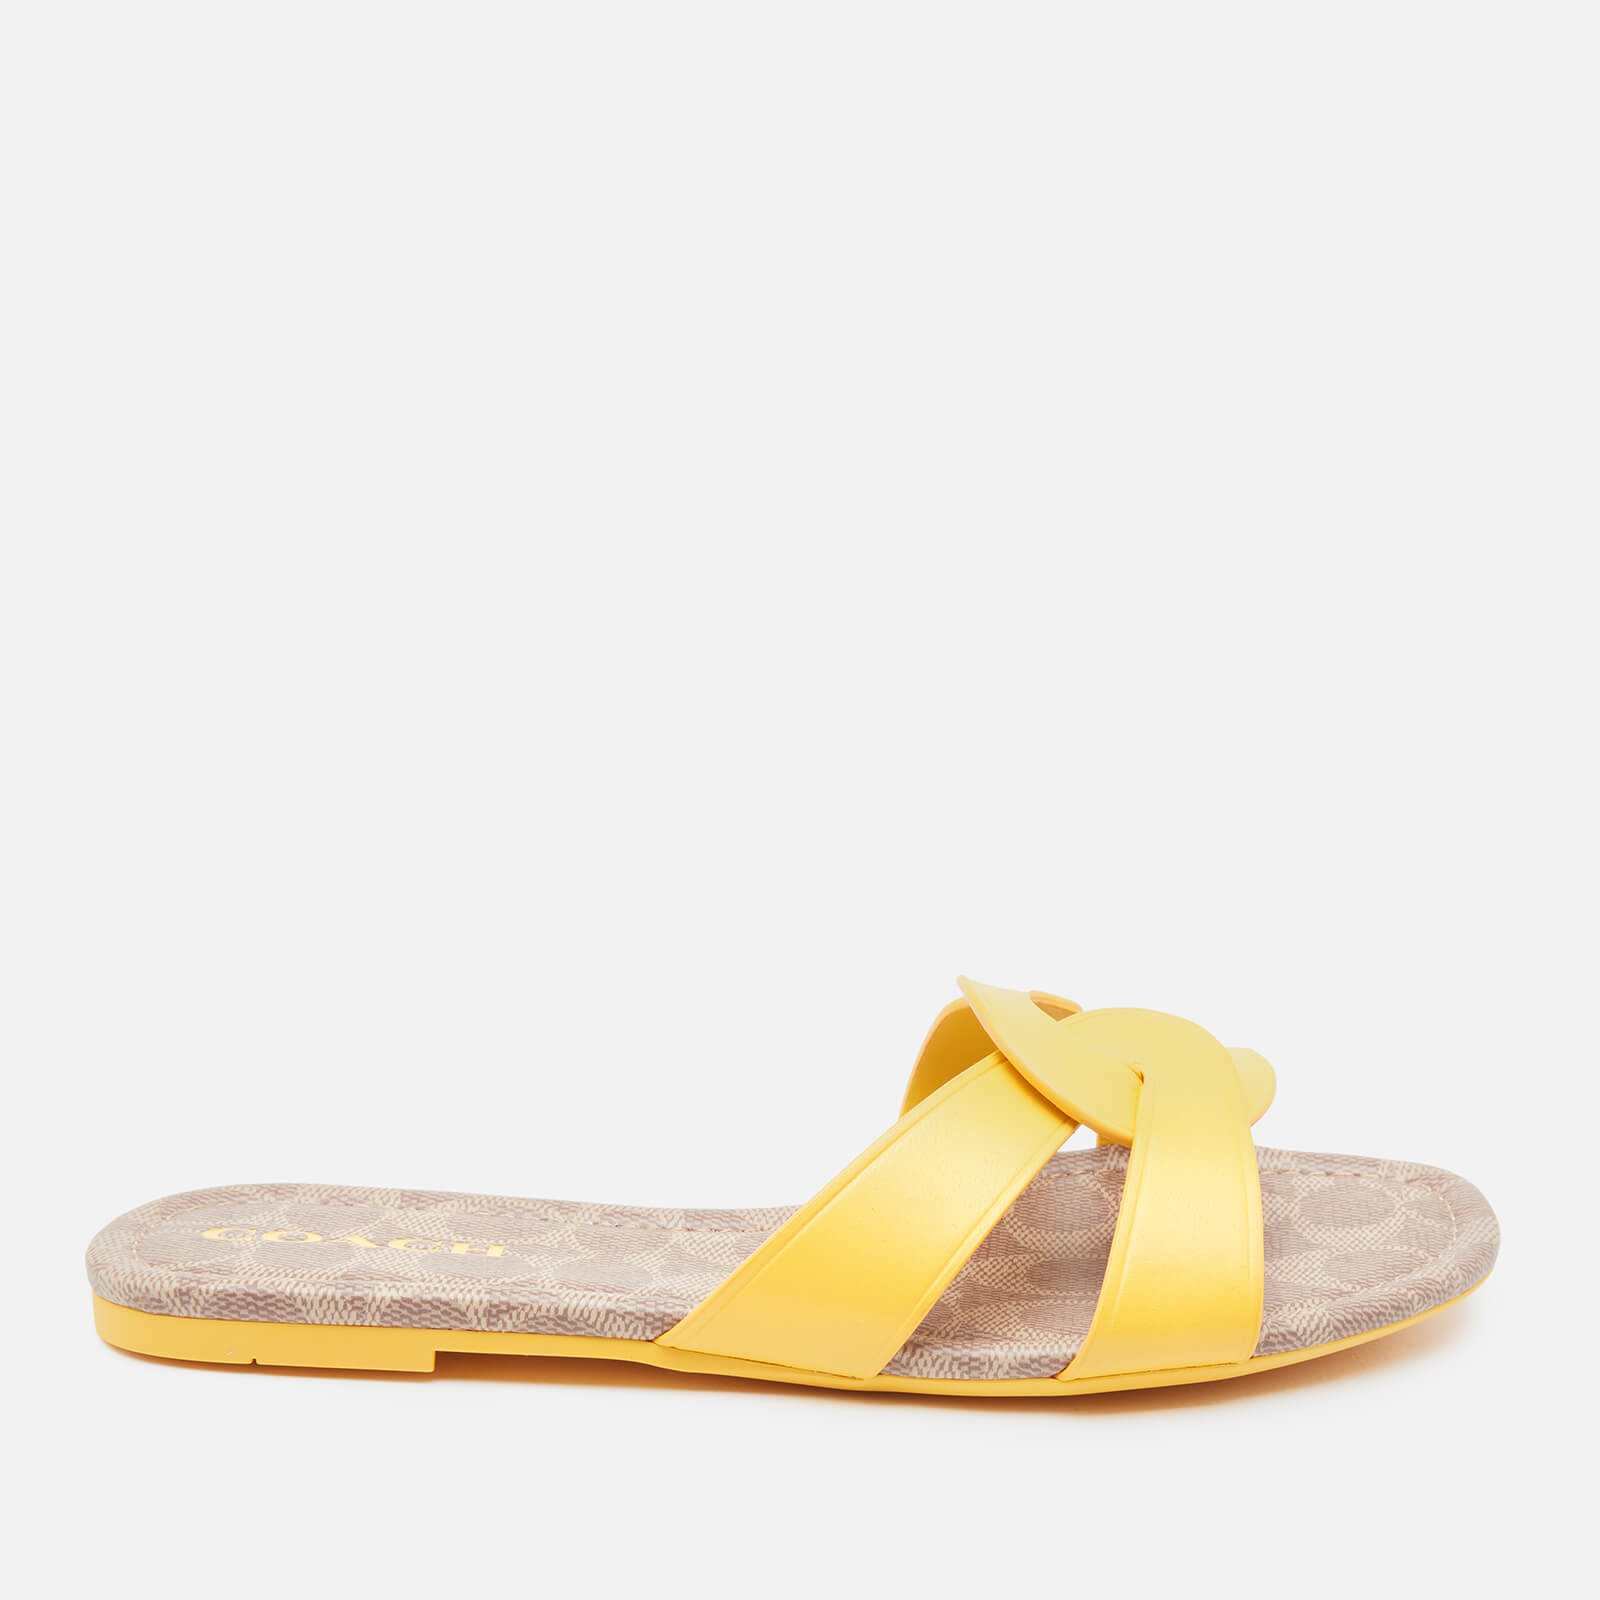 Coach Women's Essie Leather Sandals - Bright Yellow - Uk 3